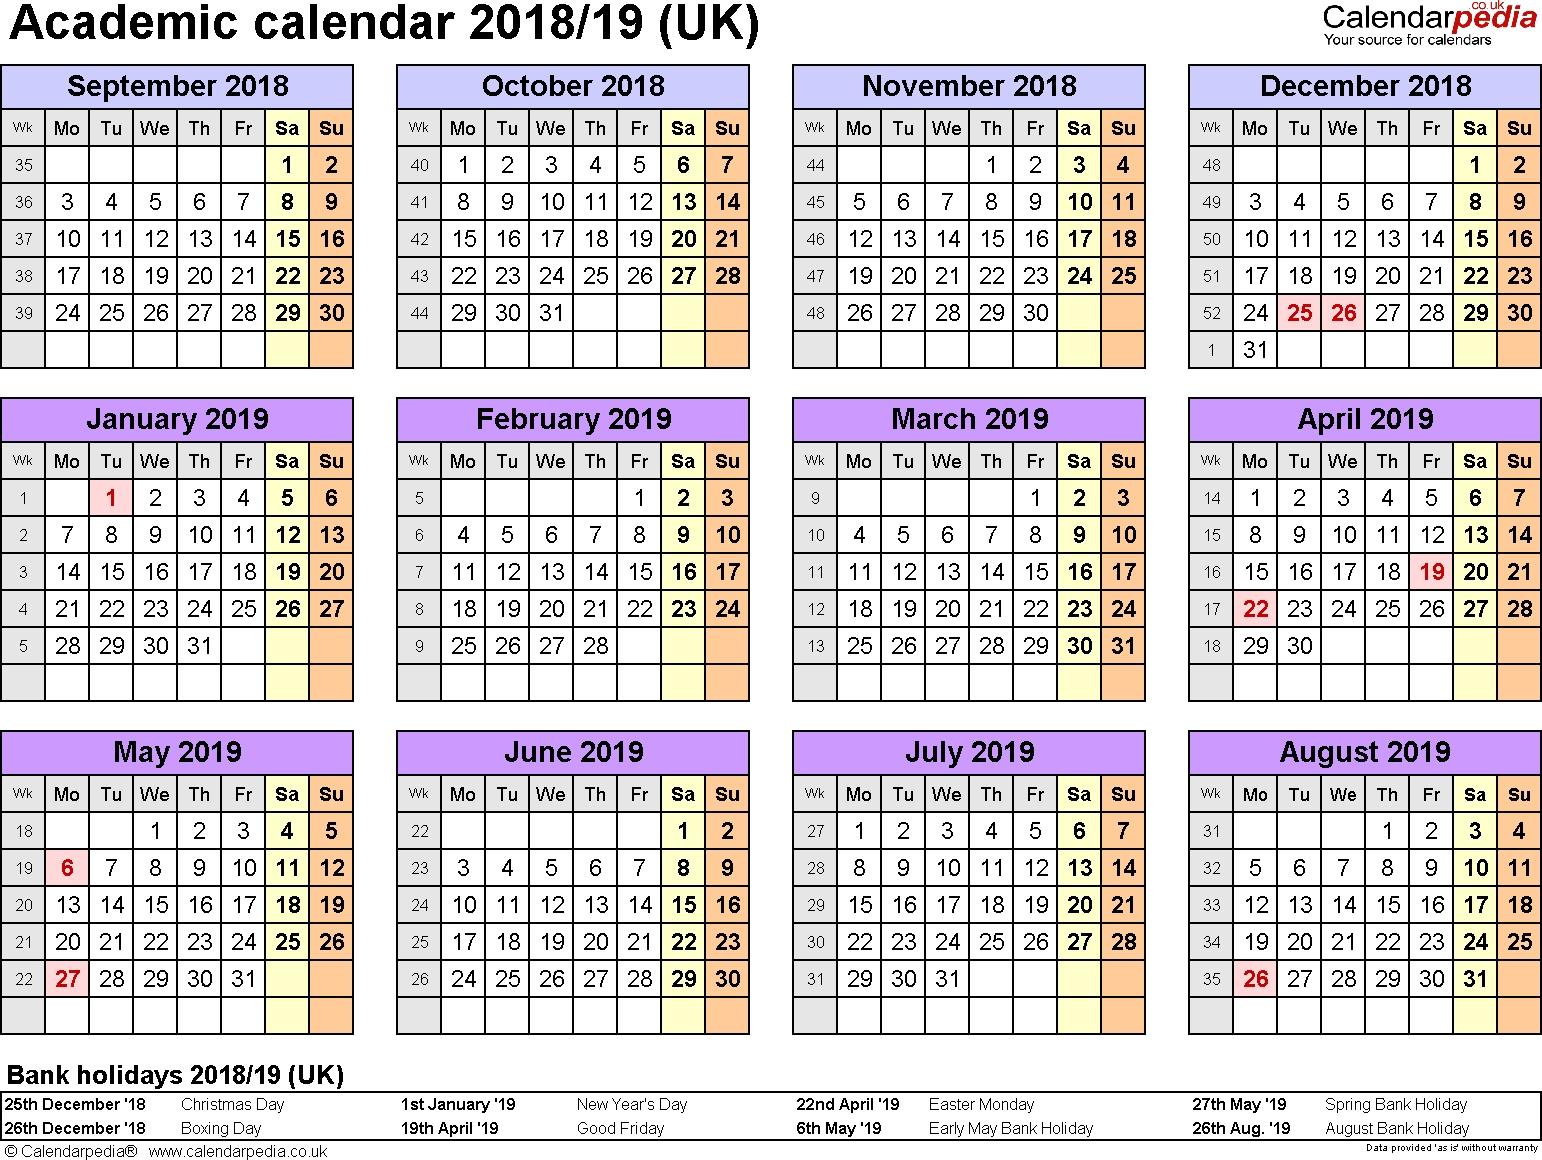 Academic Calendars 2018/2019 As Free Printable Word Templates Calendar Template School Year 2019-18